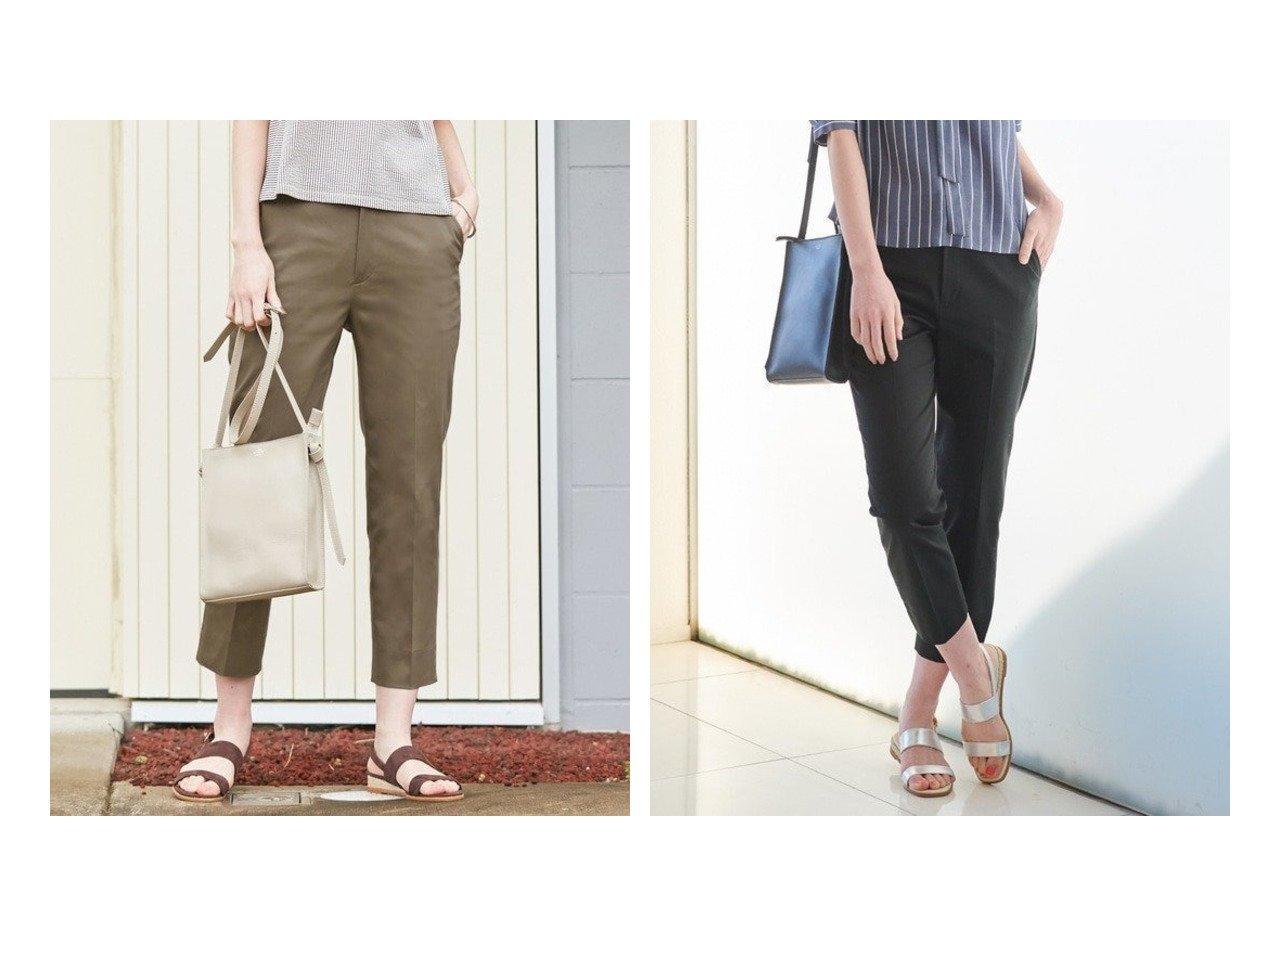 【J.PRESS/ジェイ プレス】の【洗える】サテンストレッチ パンツ パンツのおすすめ!人気、トレンド・レディースファッションの通販 おすすめで人気の流行・トレンド、ファッションの通販商品 メンズファッション・キッズファッション・インテリア・家具・レディースファッション・服の通販 founy(ファニー) https://founy.com/ ファッション Fashion レディースファッション WOMEN パンツ Pants 送料無料 Free Shipping サテン シンプル ストレッチ センター フィット 洗える |ID:crp329100000016066